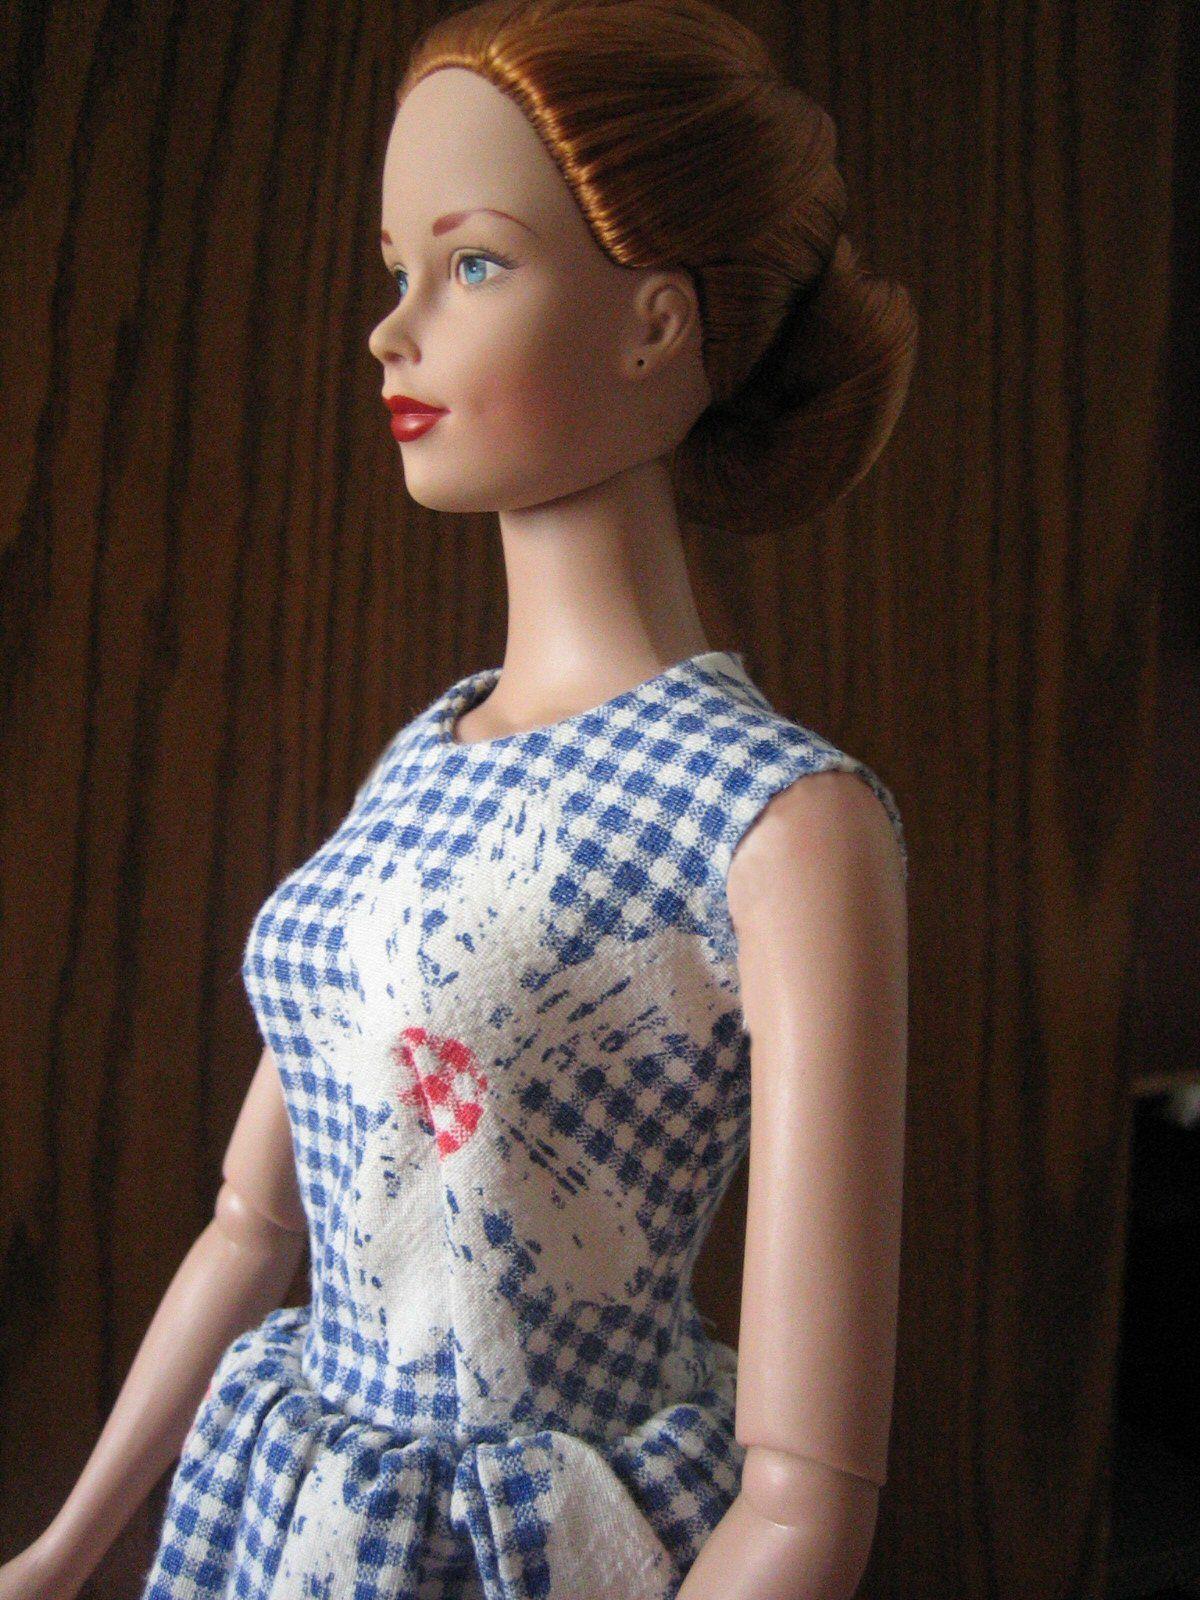 Brenda_dress2.jpg (44556 bytes)   Nähen für Puppen   Pinterest ...